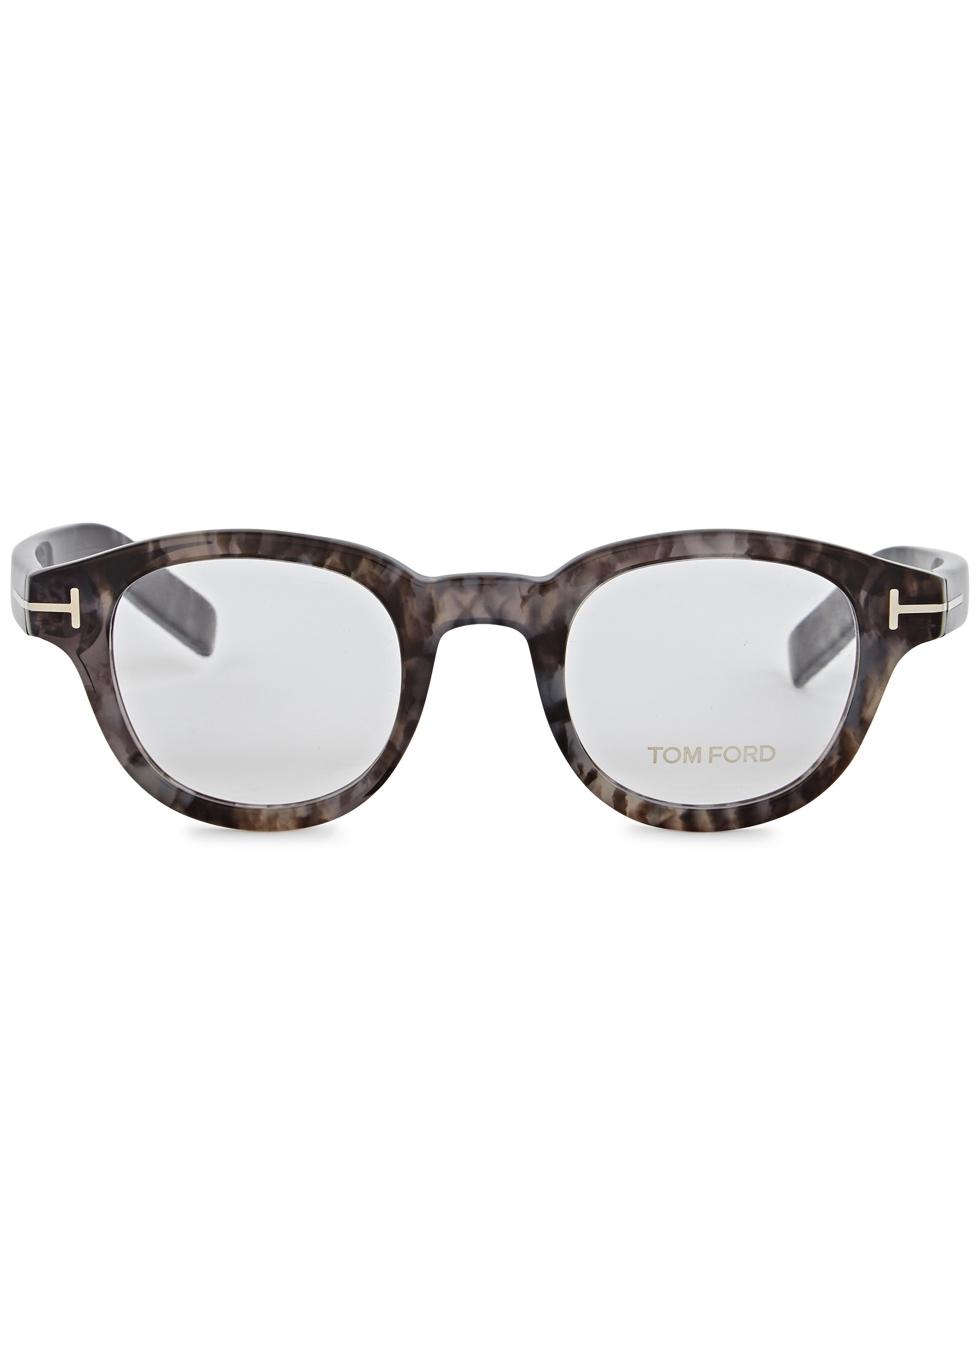 Marbled round-frame optical glasses - Tom Ford